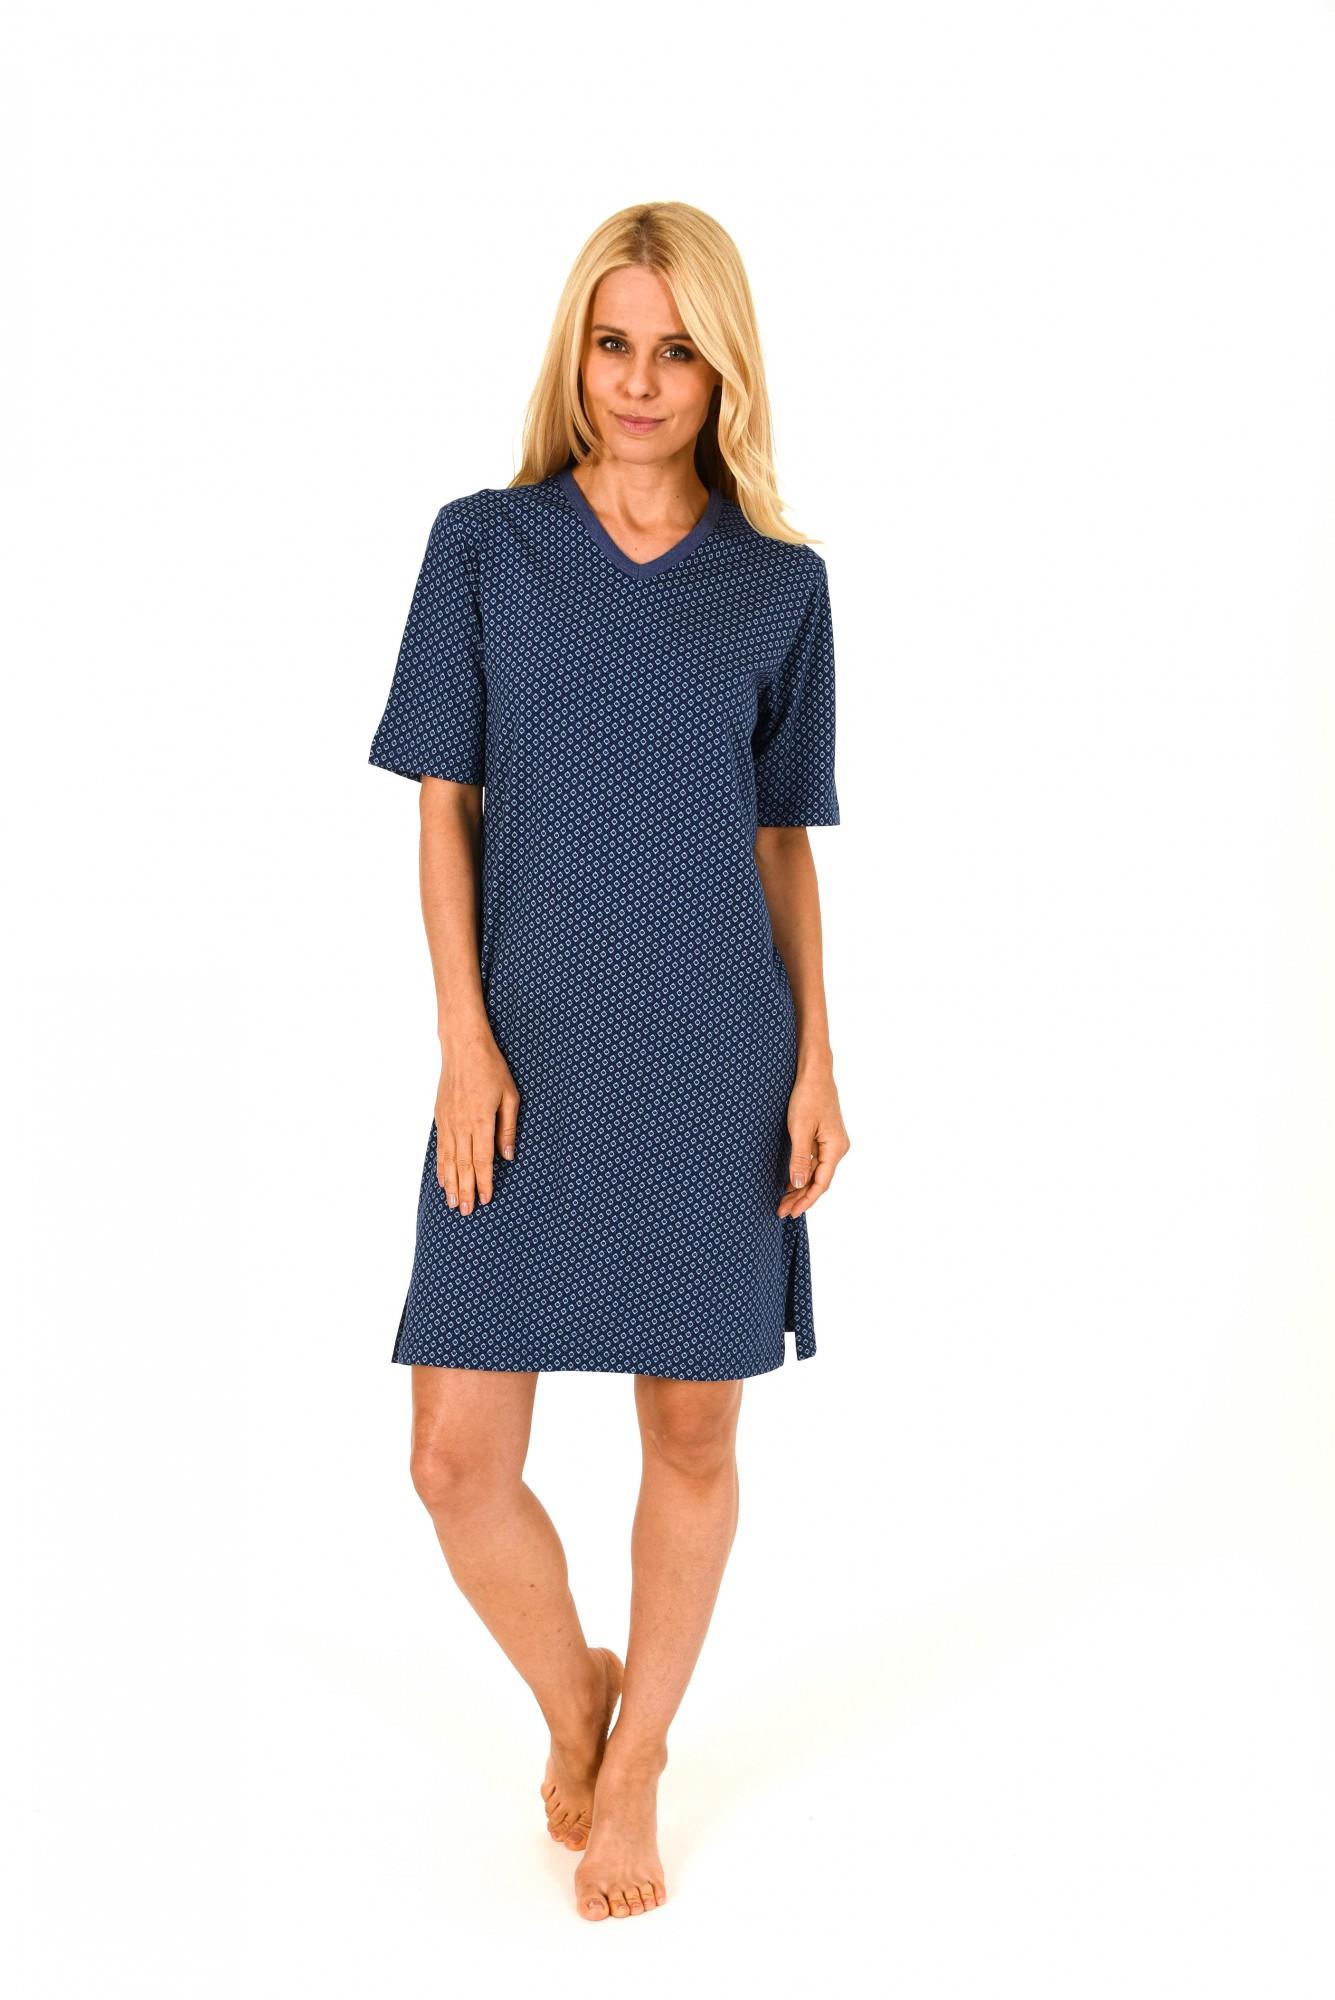 Damen Nachthemd Bigshirt kurzarm mit wunderschönen Minimalprint – 171 213 90 839 – Bild 1